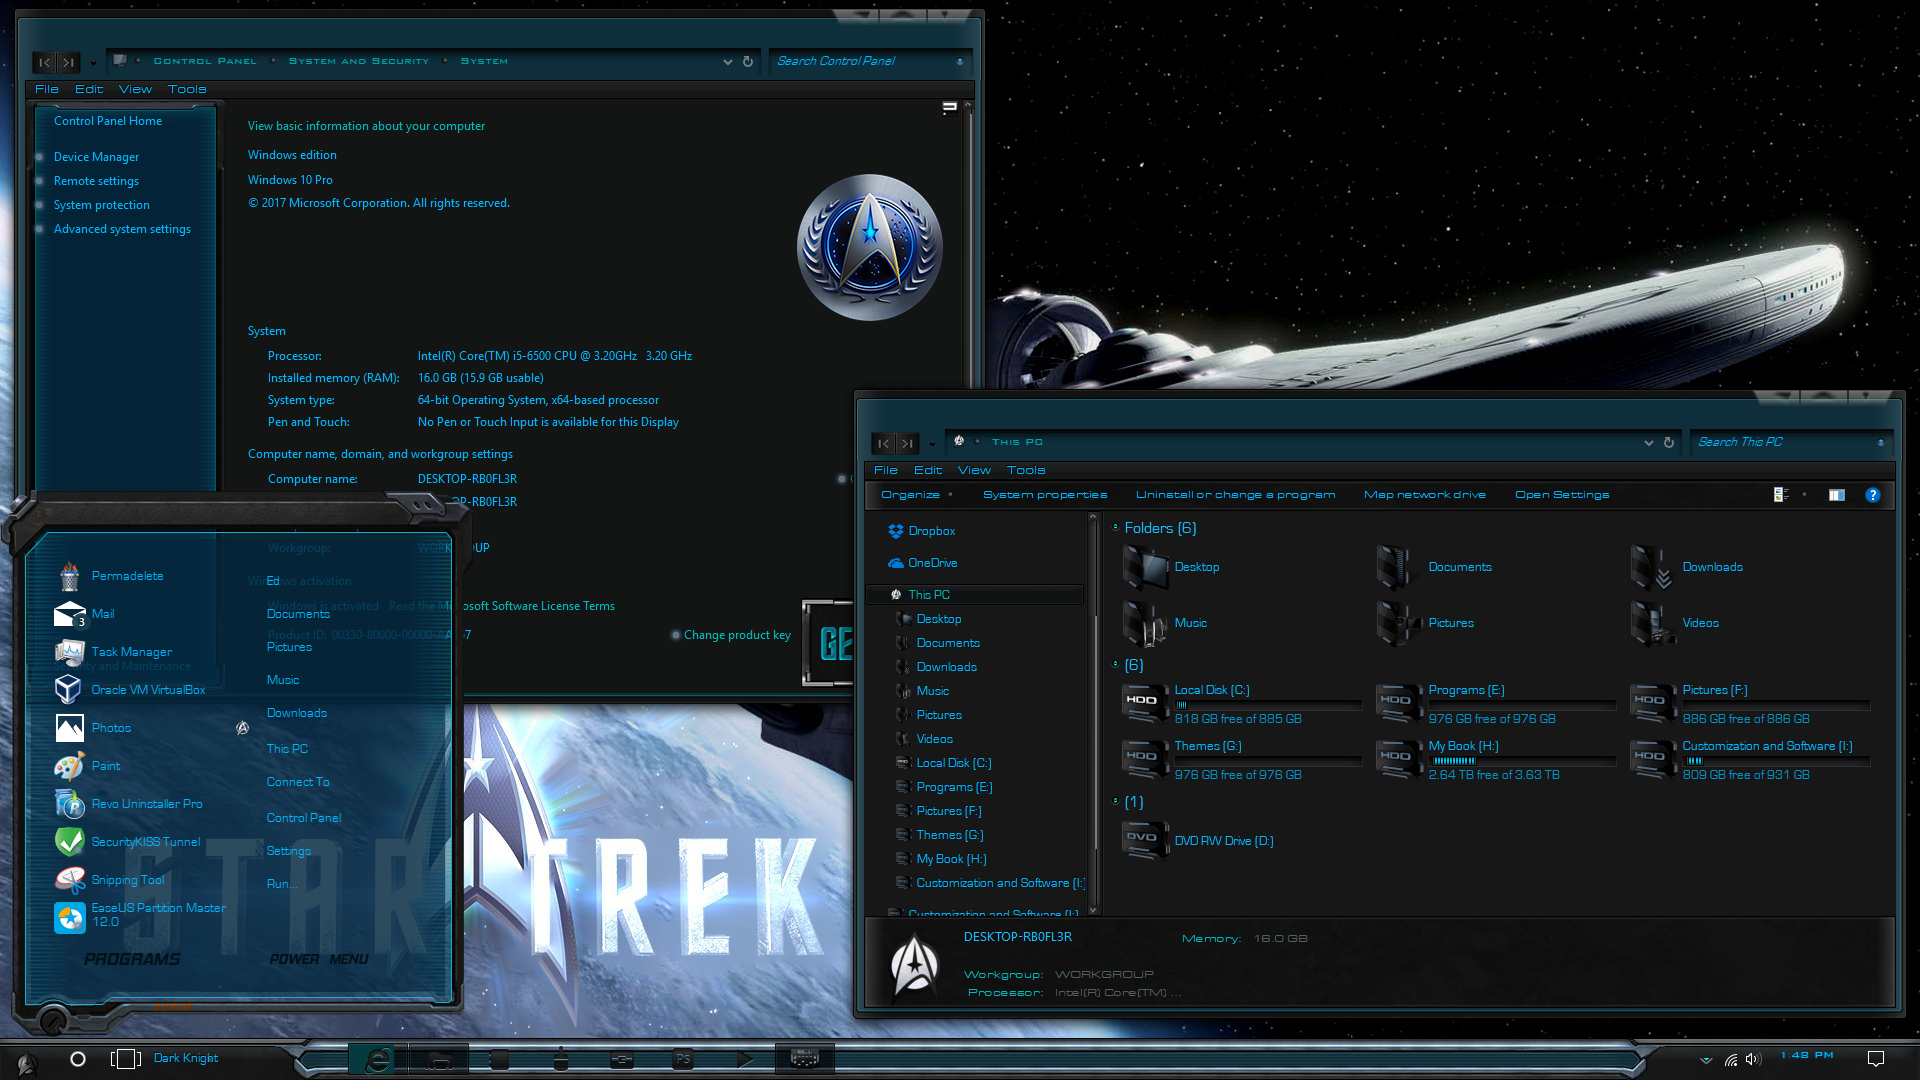 Star Trek for Windows 10 1703 - 1903 - Page 2